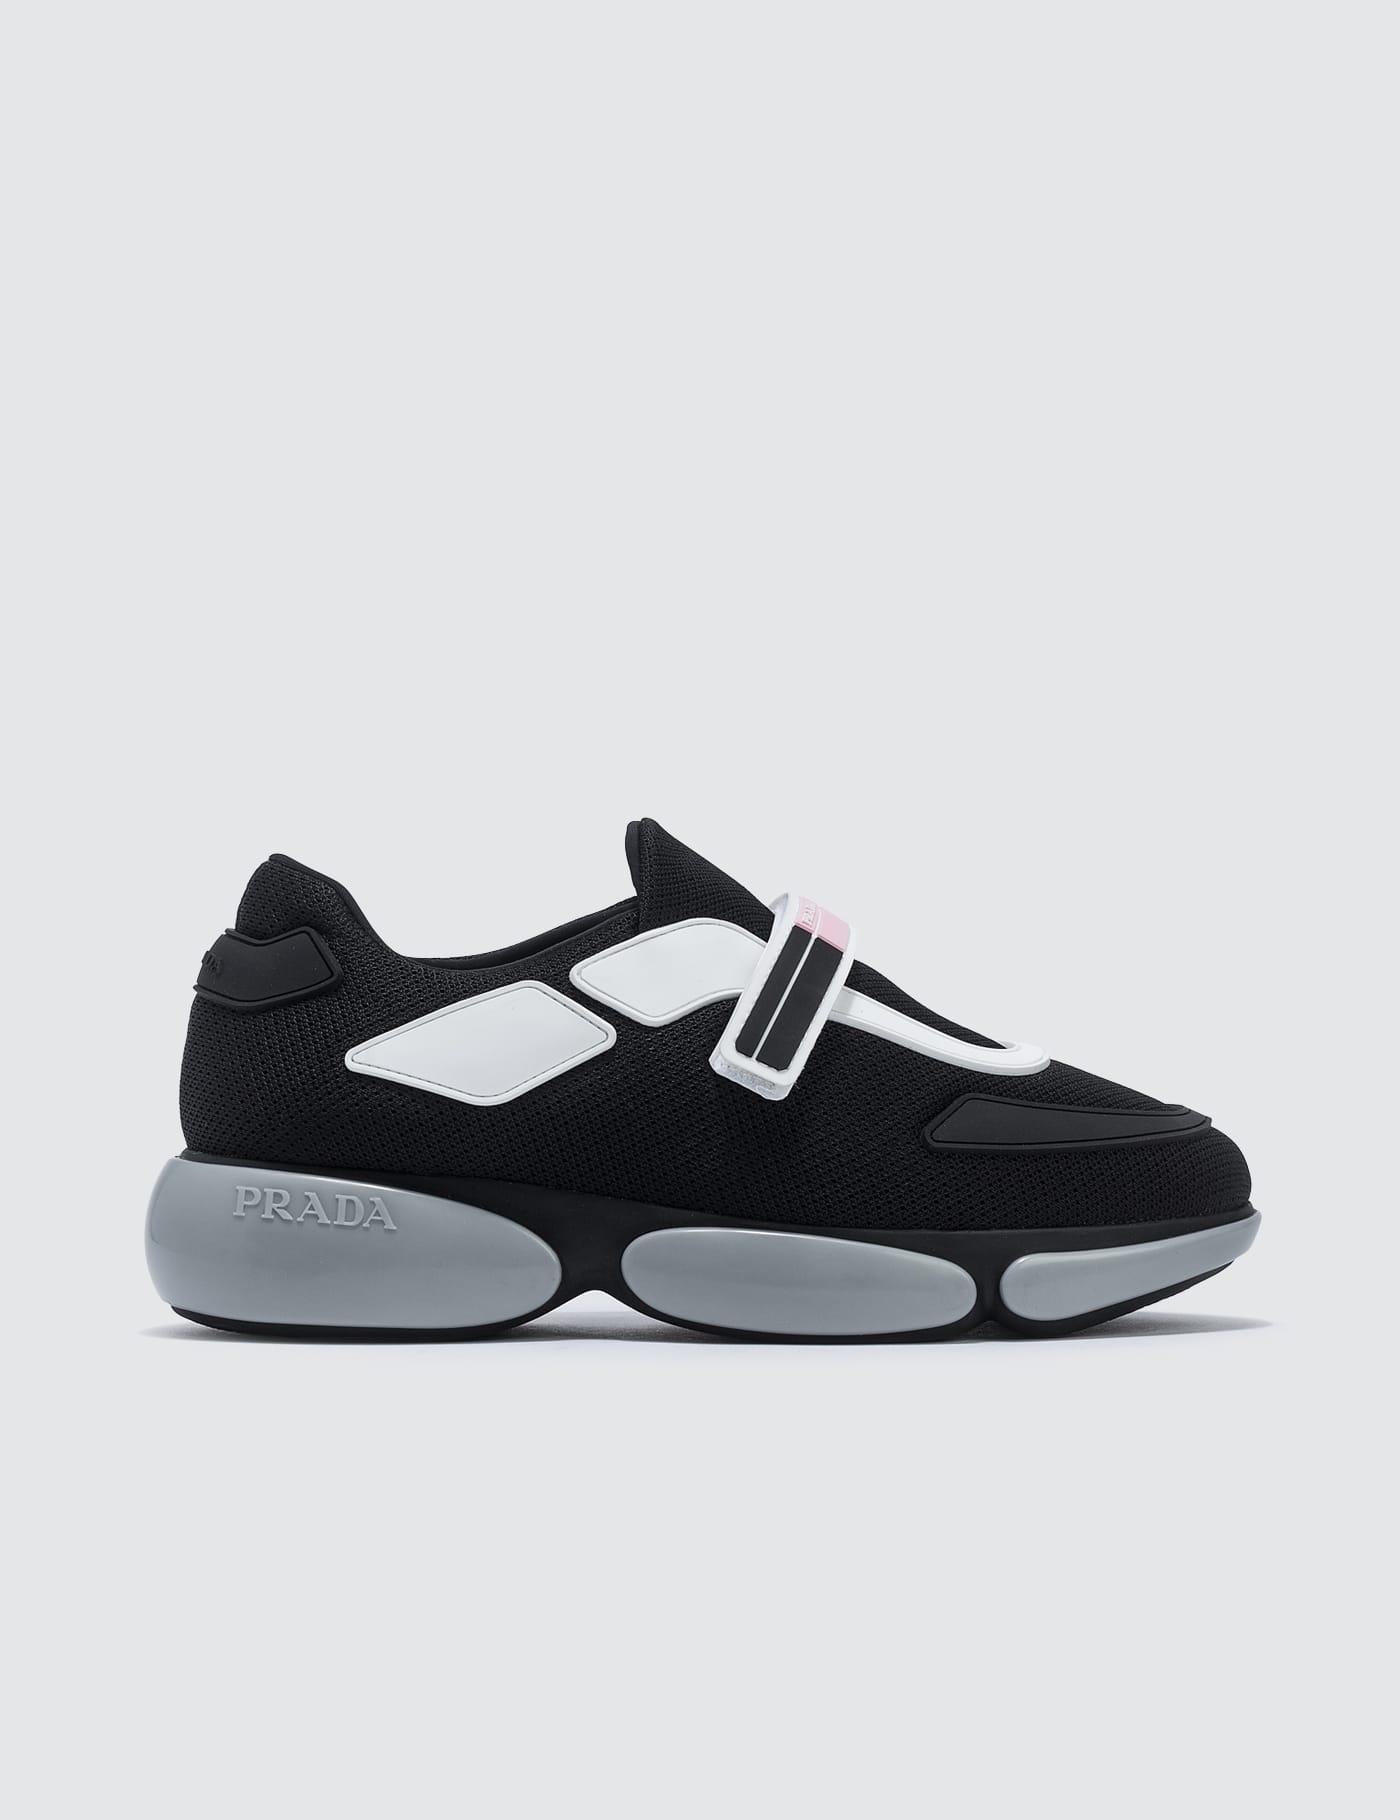 Prada - Cloudbust Sneakers | HBX